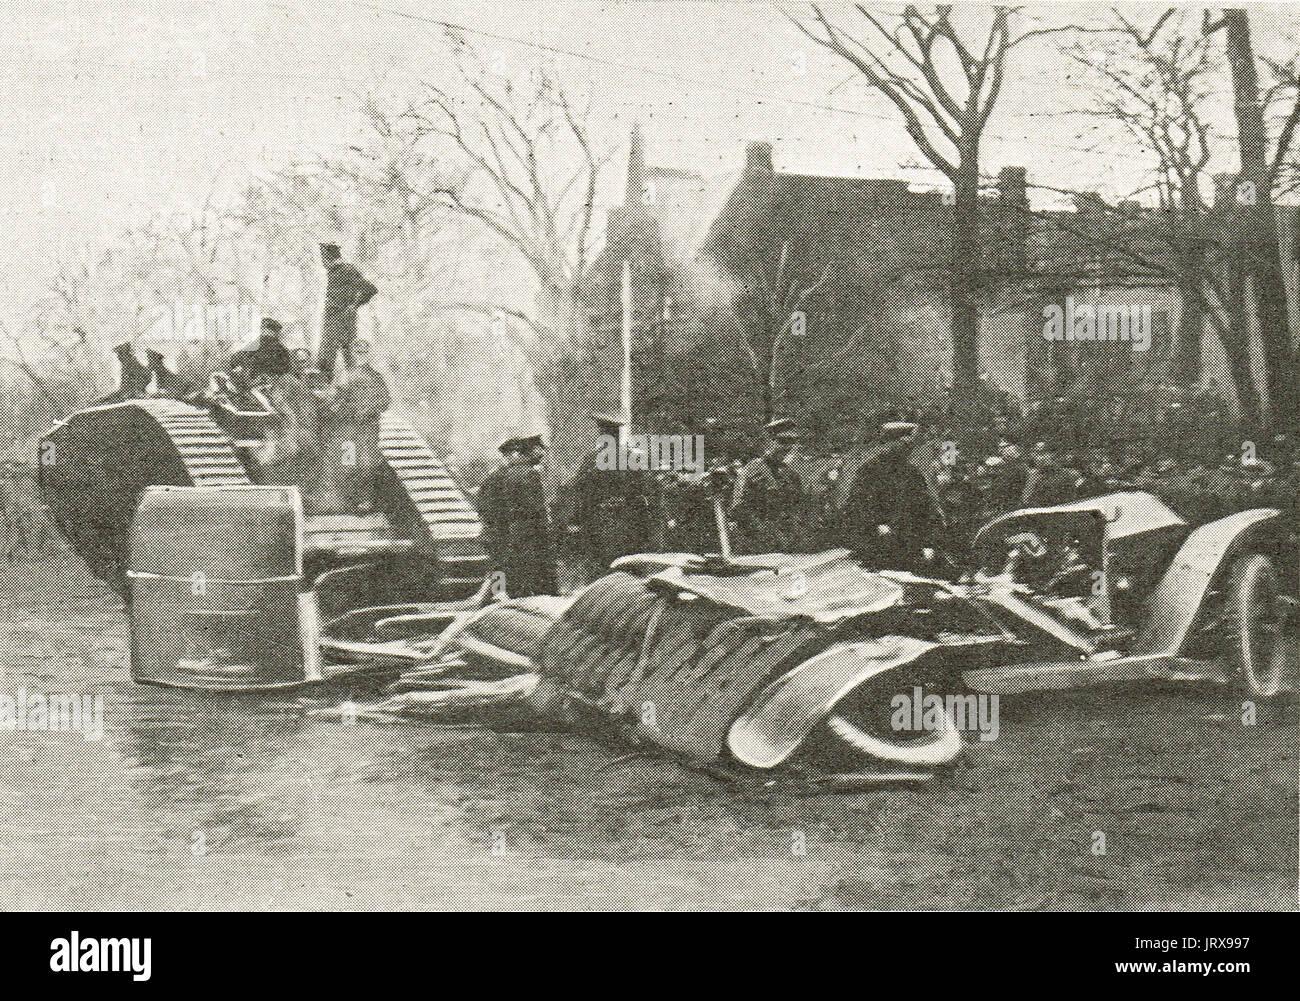 Tank V Car, victory loan demo, Toronto 1917 - Stock Image